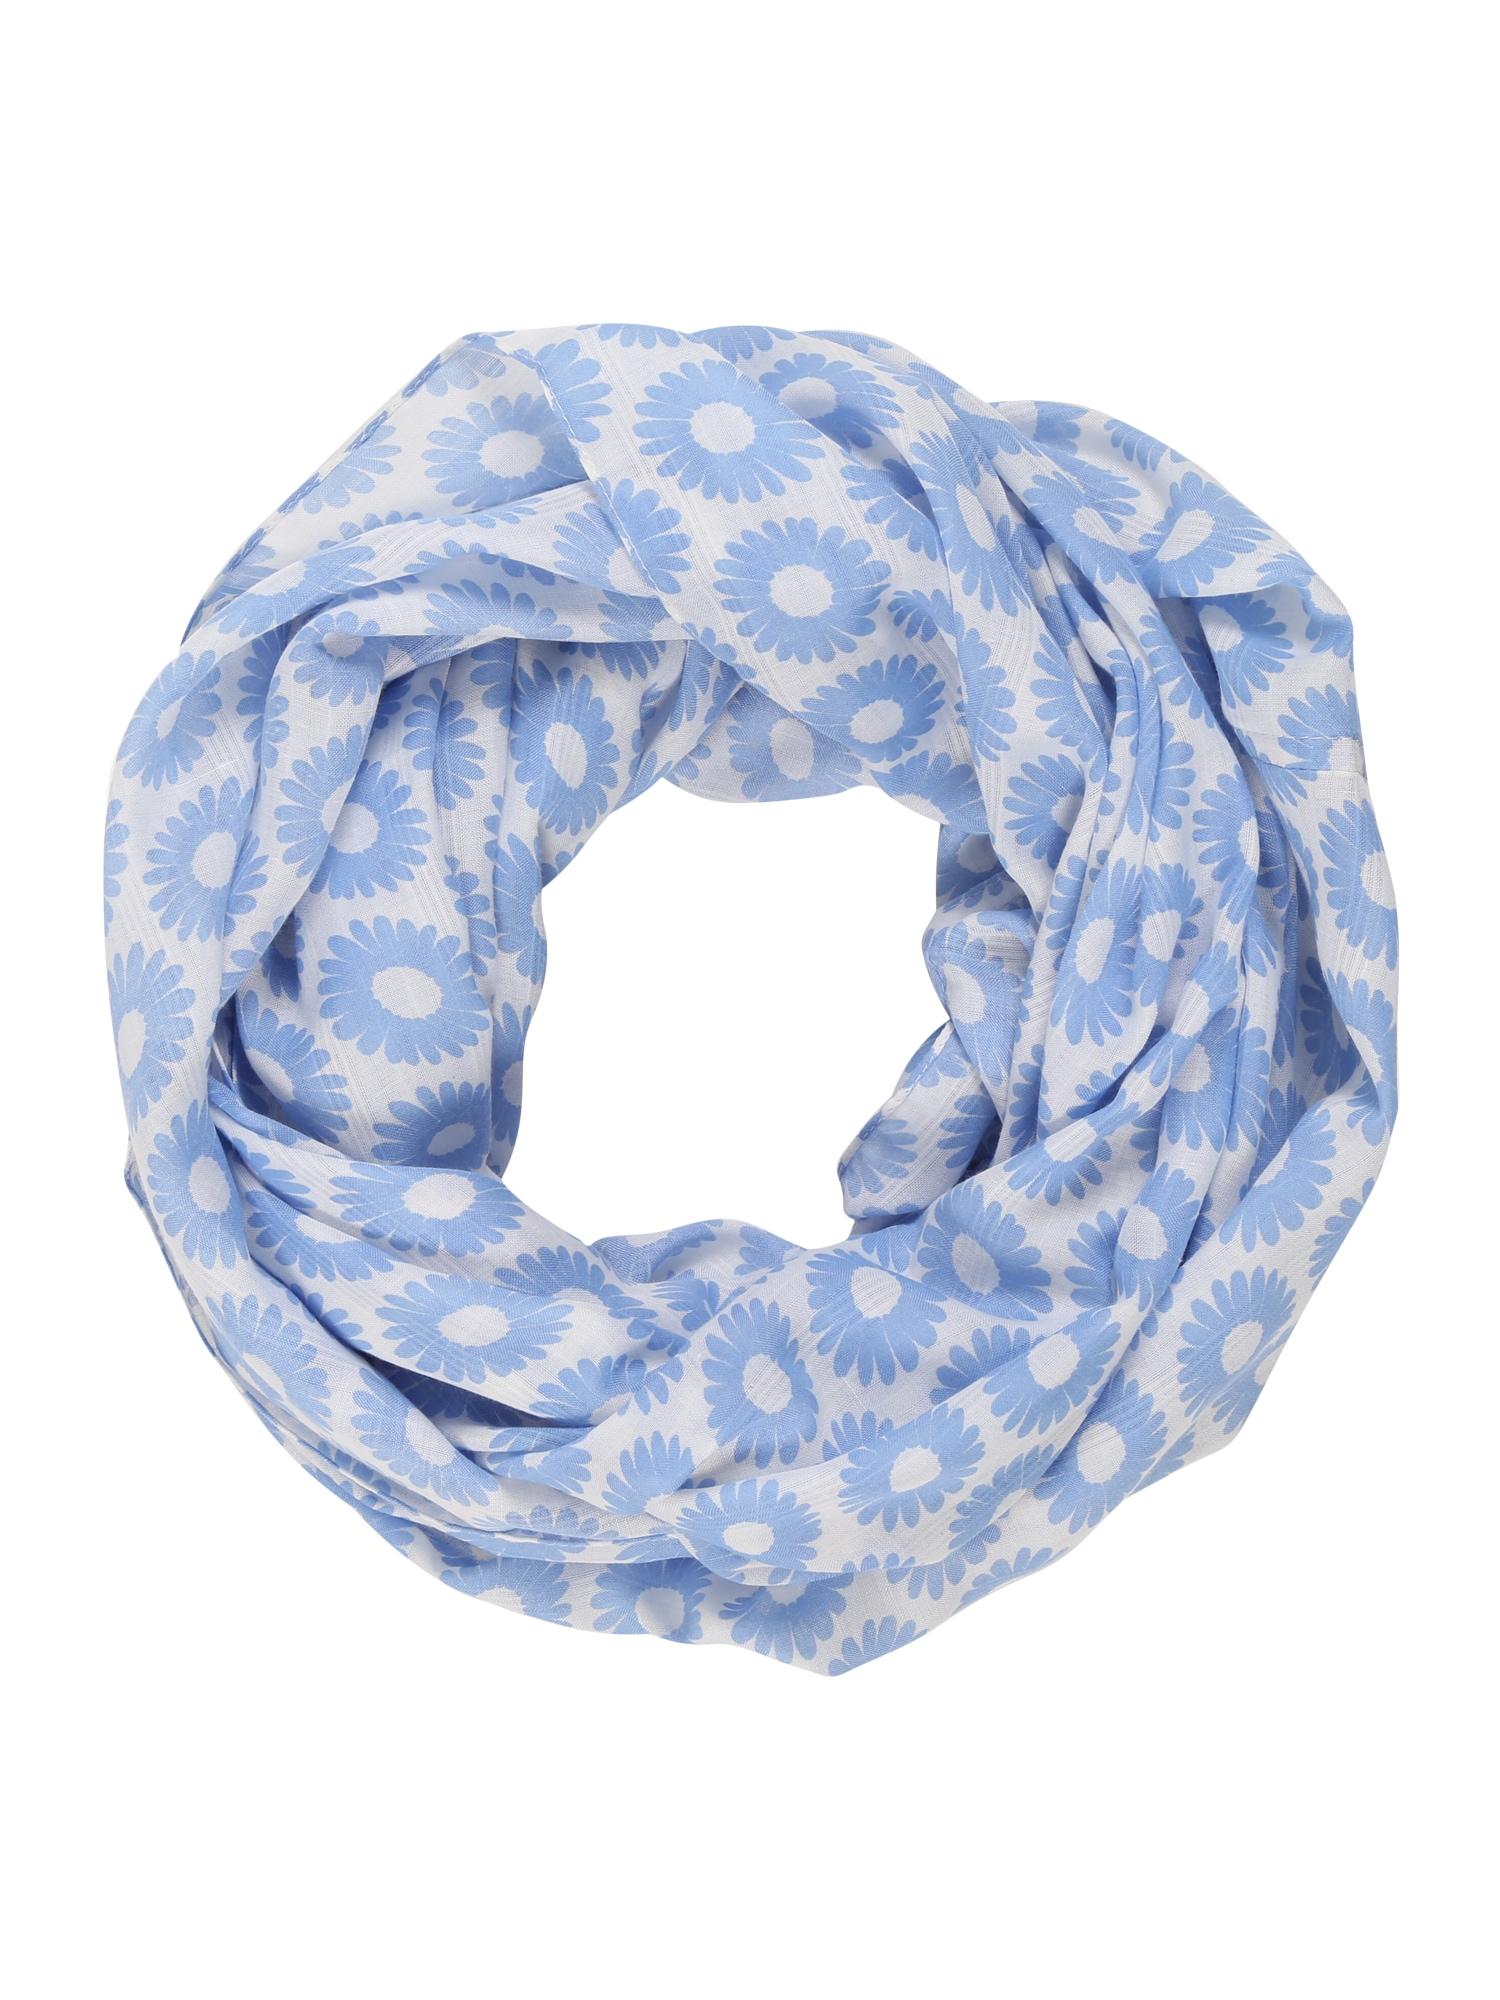 ESPRIT Mova 'NOS_RCS_FlowerInfin' šviesiai mėlyna